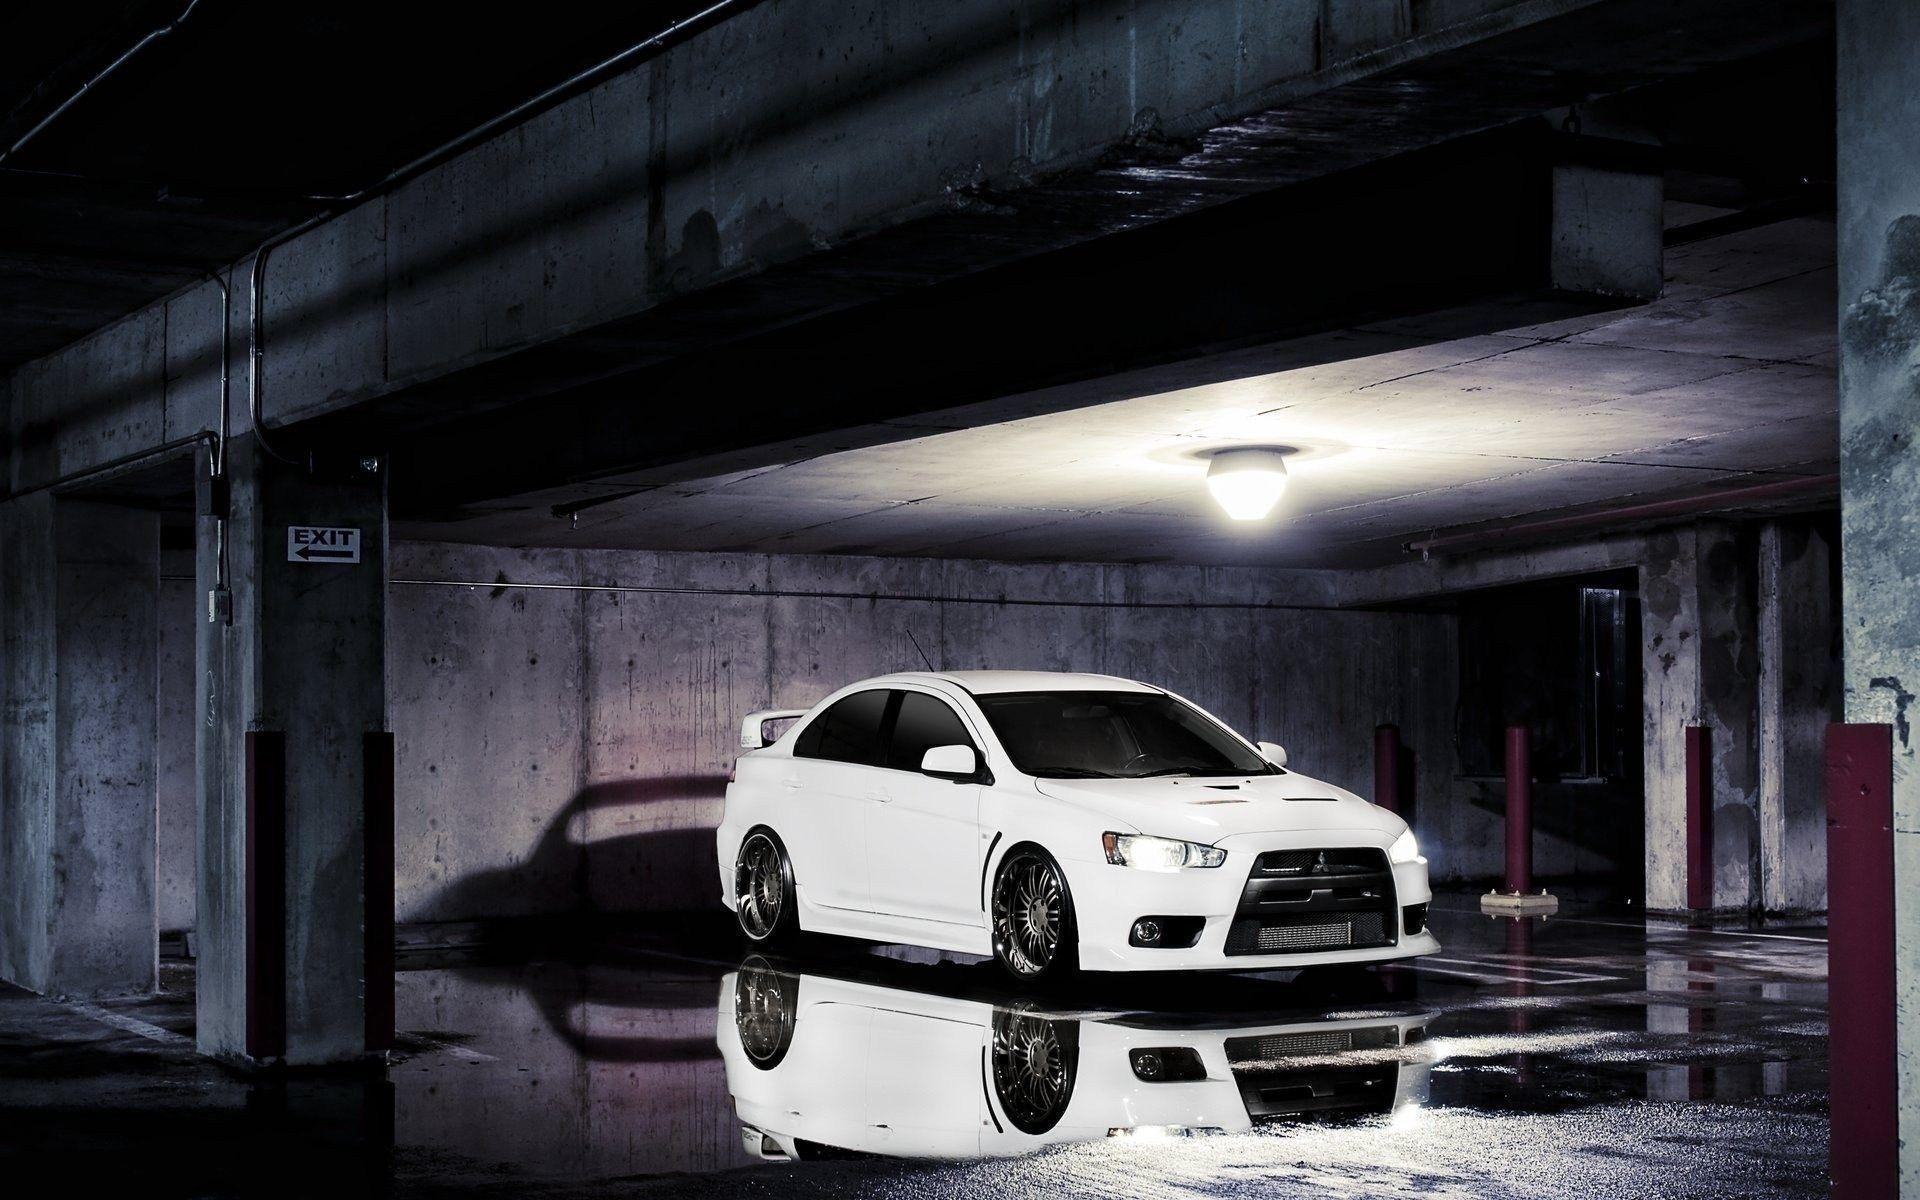 mitsubishi lancer evolution x parking water reflection floor hd - Mitsubishi Evolution 10